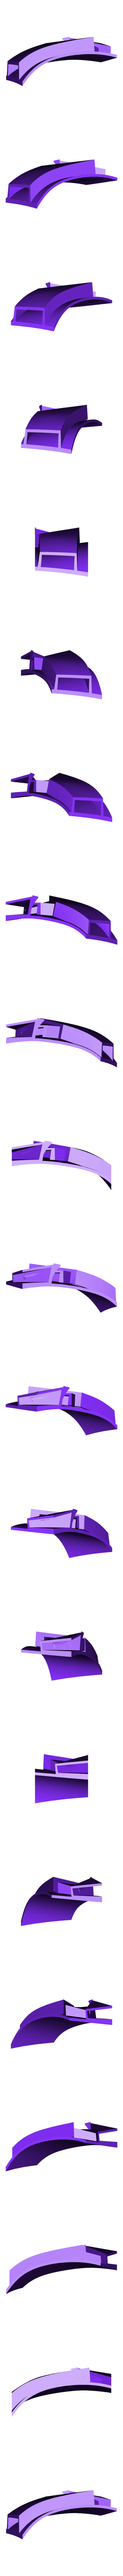 Part 8 v1.stl Download STL file ARF Trooper Helmet • 3D print object, VillainousPropShop